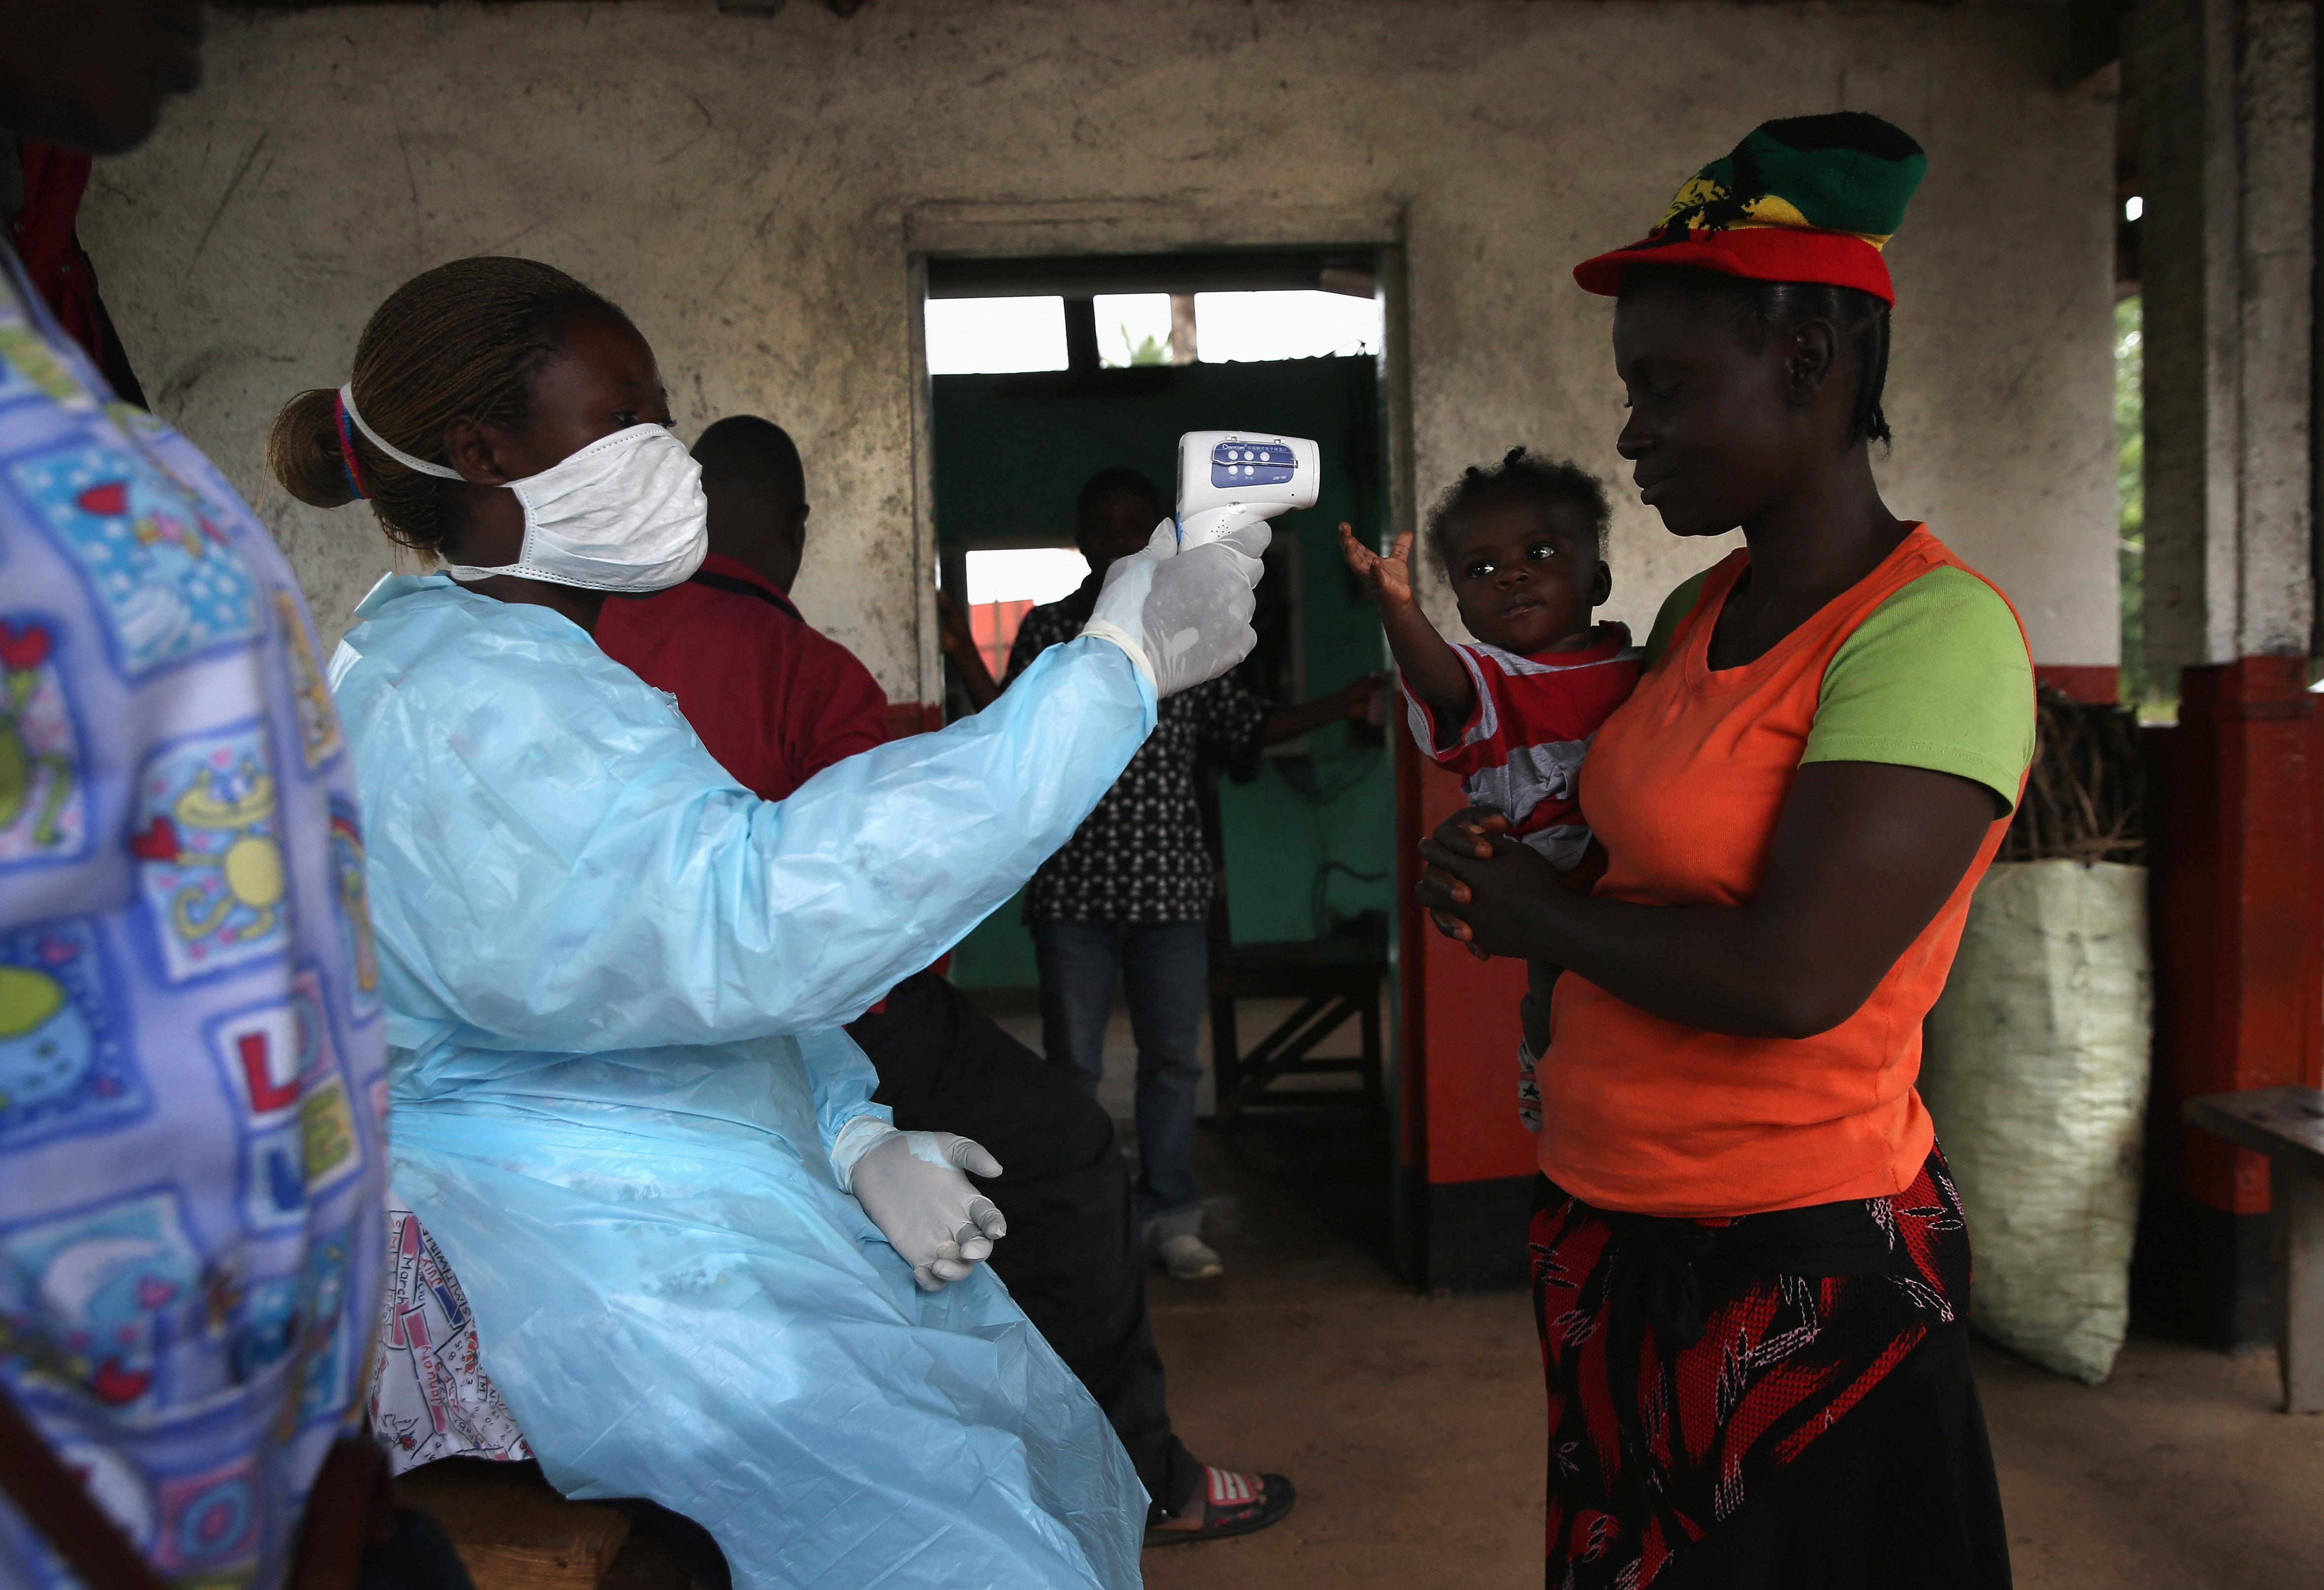 Residents Of Quarantined Town Near International Airport Endure Ebola Epidemic